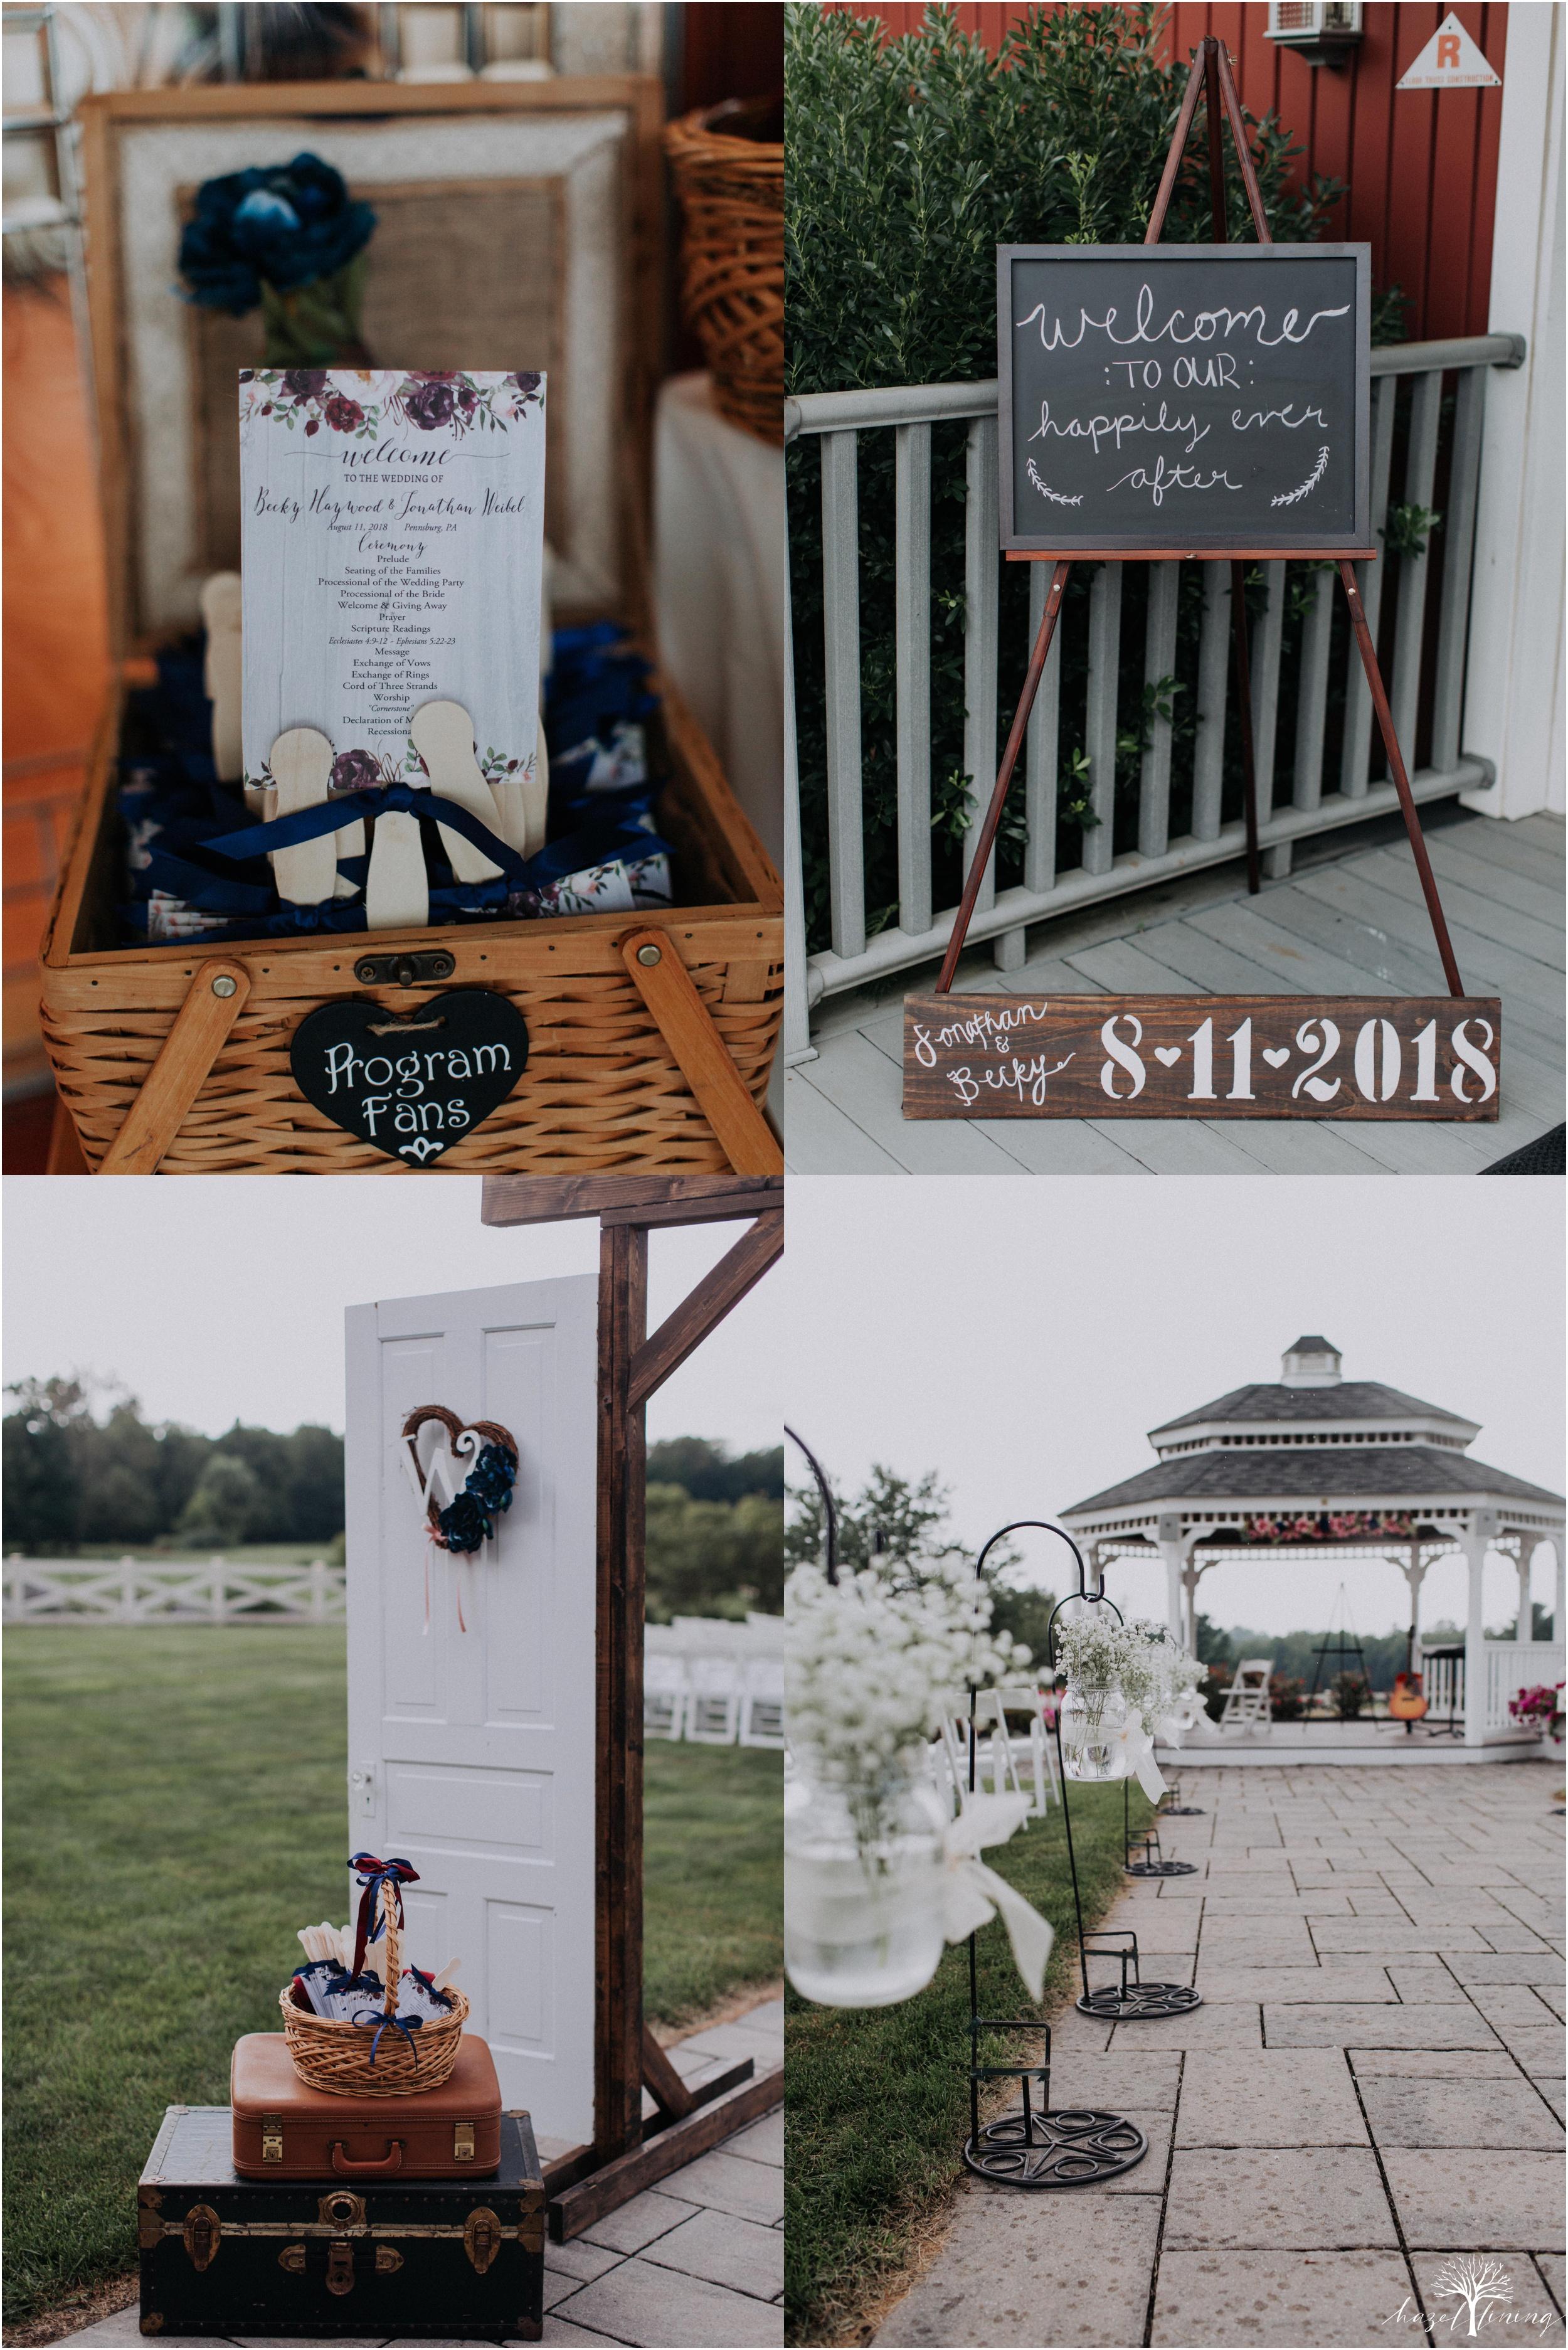 jonathan-weibel-becky-haywood-loft-at-sweetwater-cc-pennsburg-pennsylvania-rainy-day-summer-wedding-hazel-lining-travel-wedding-elopement-photography_0035.jpg